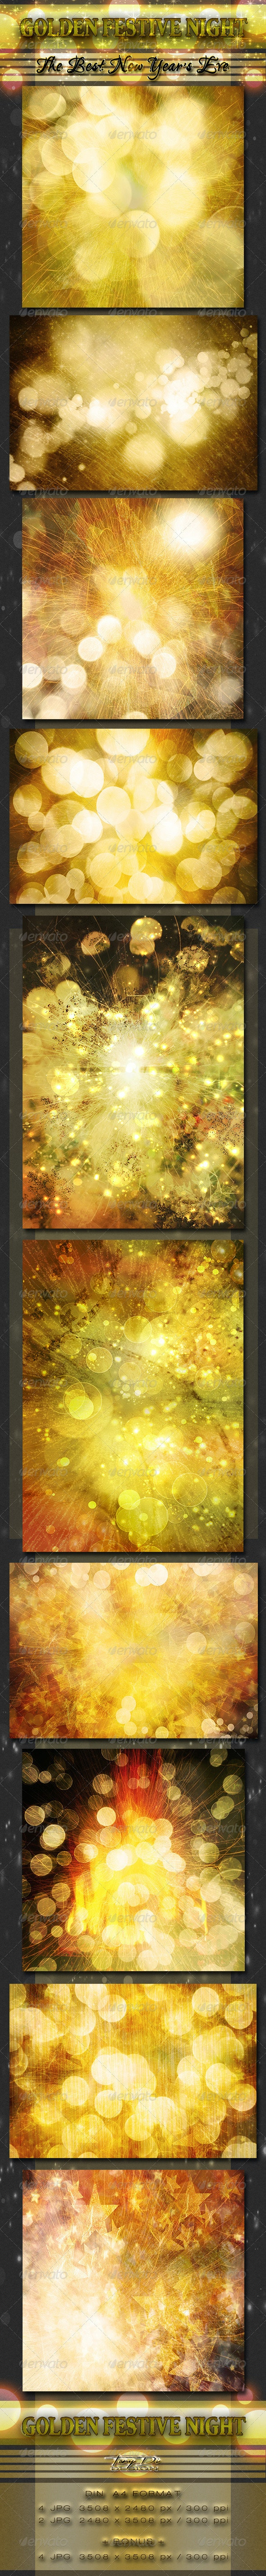 Golden Festive Night - Miscellaneous Backgrounds